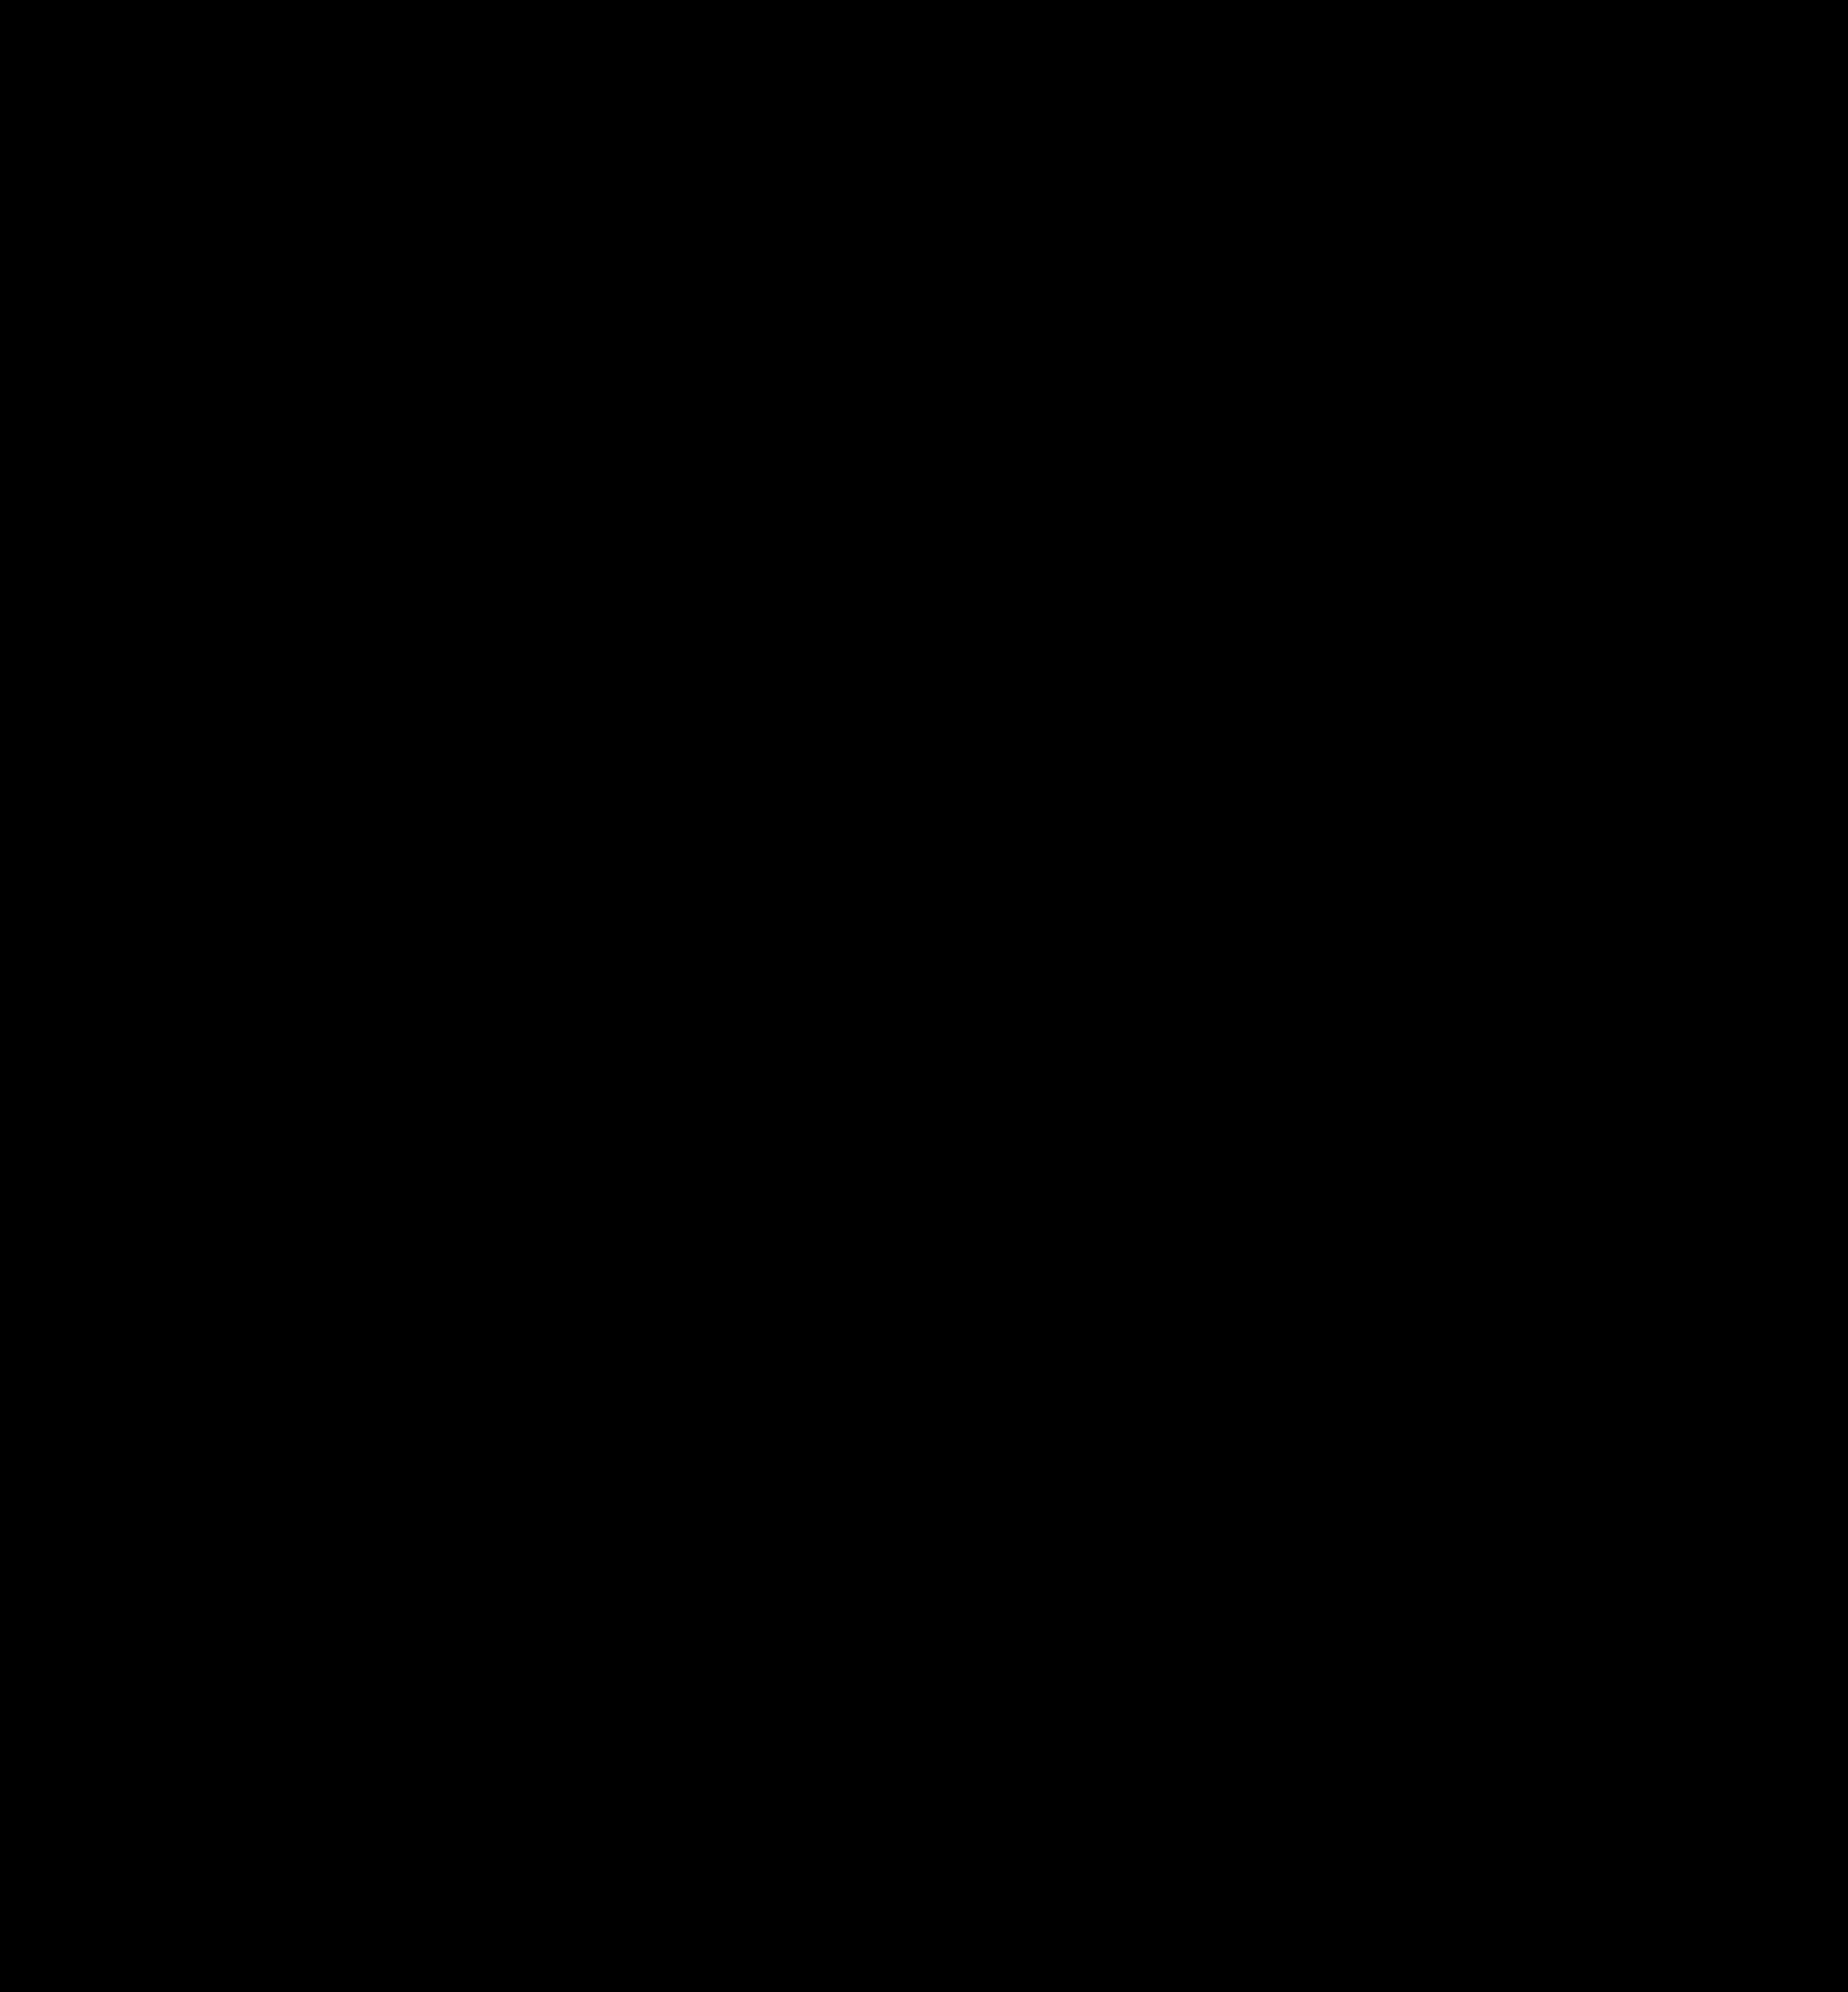 Clipart Euclid Initial Letter Z